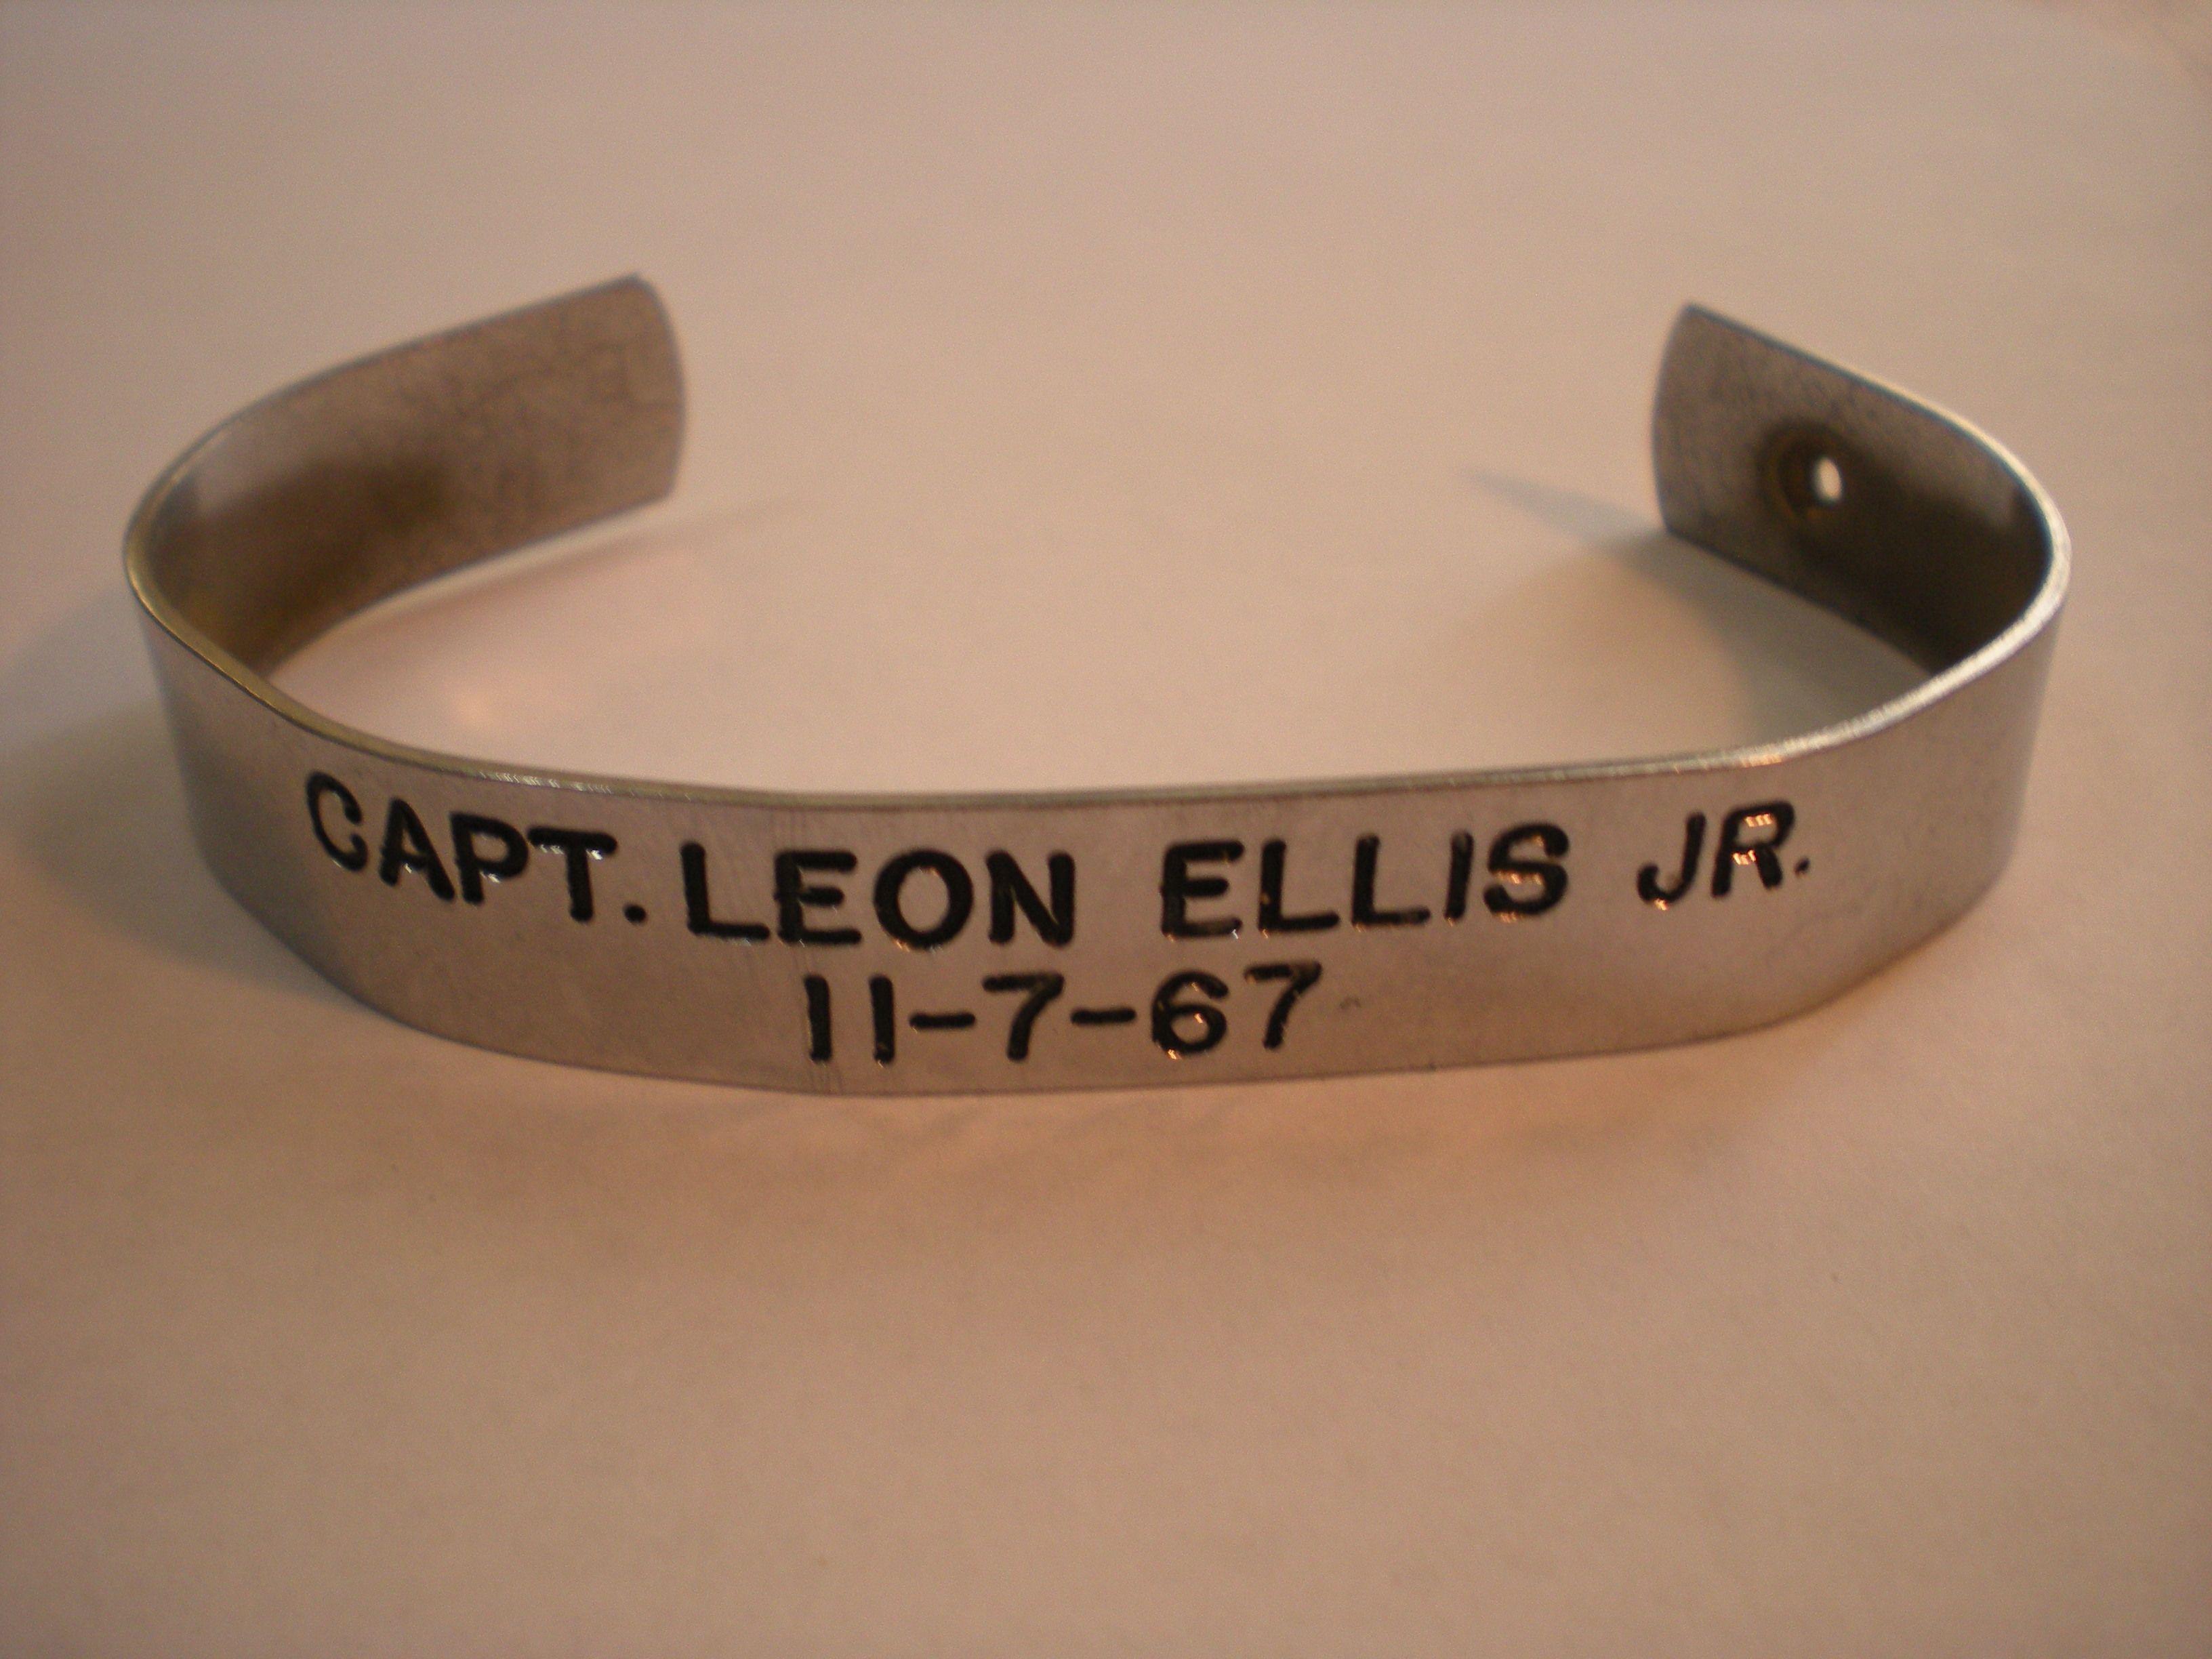 memorial from tm for kia moore november bracelets and wear bracelet lyon a ashcraft why martinez